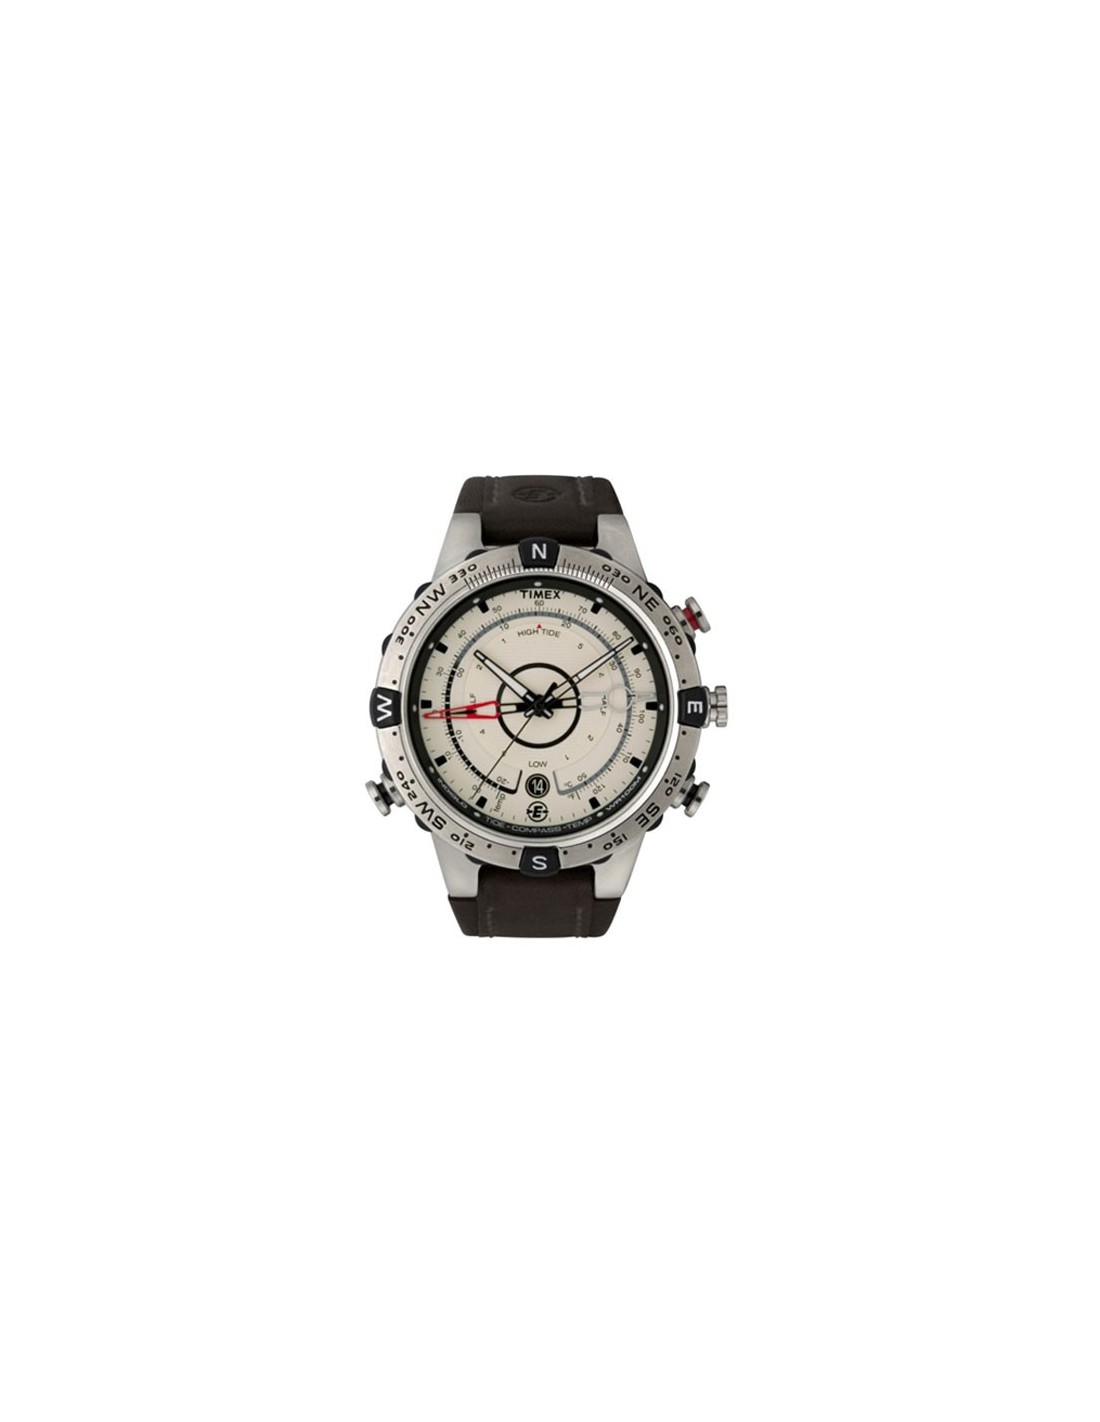 25dfe2a8f2c0 Timex Watch T45601 - Timex Watches